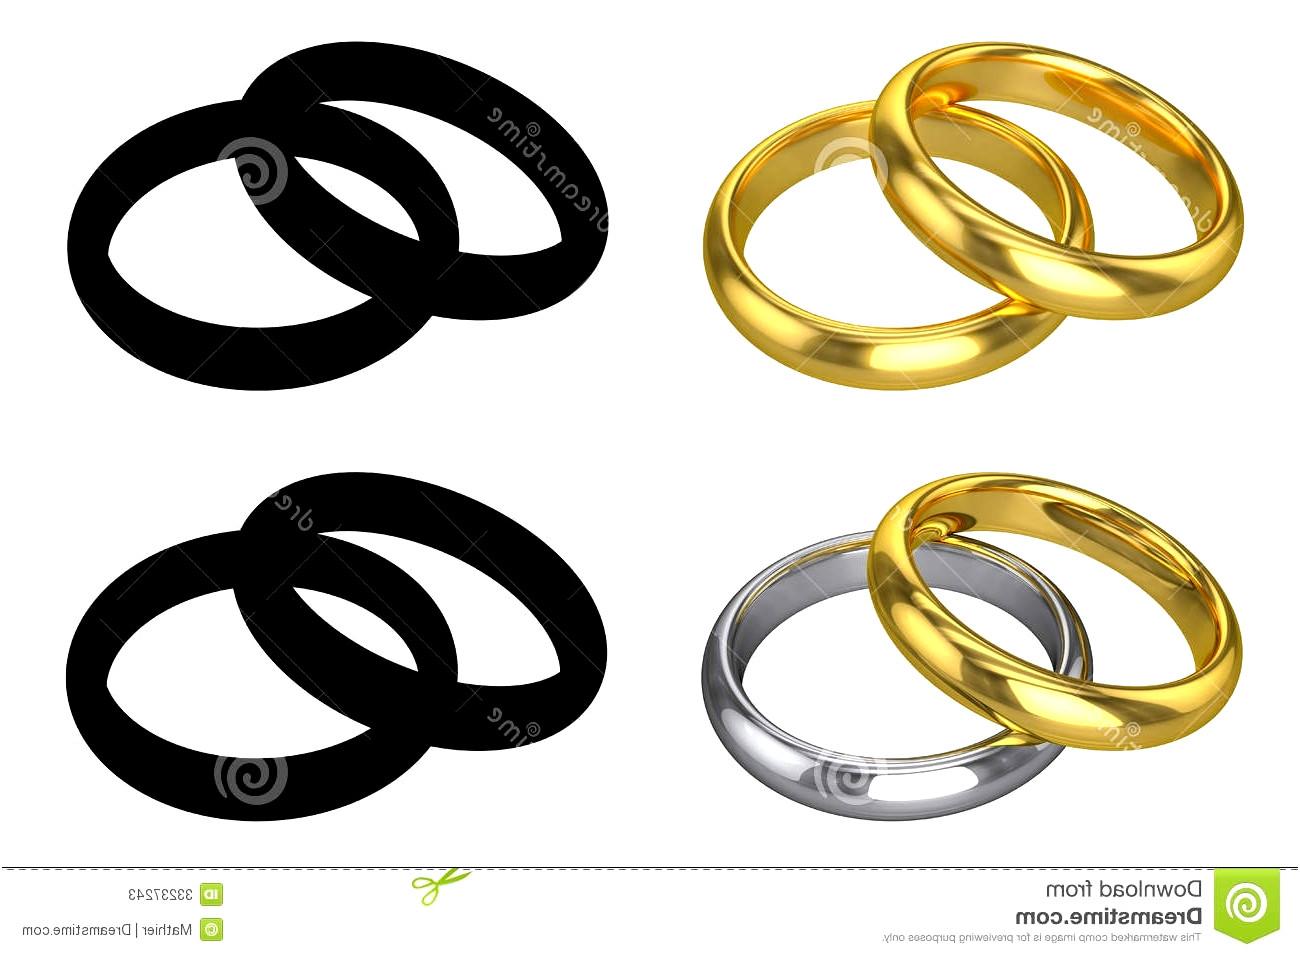 50 Mariage Thème Seigneur Des Anneaux.